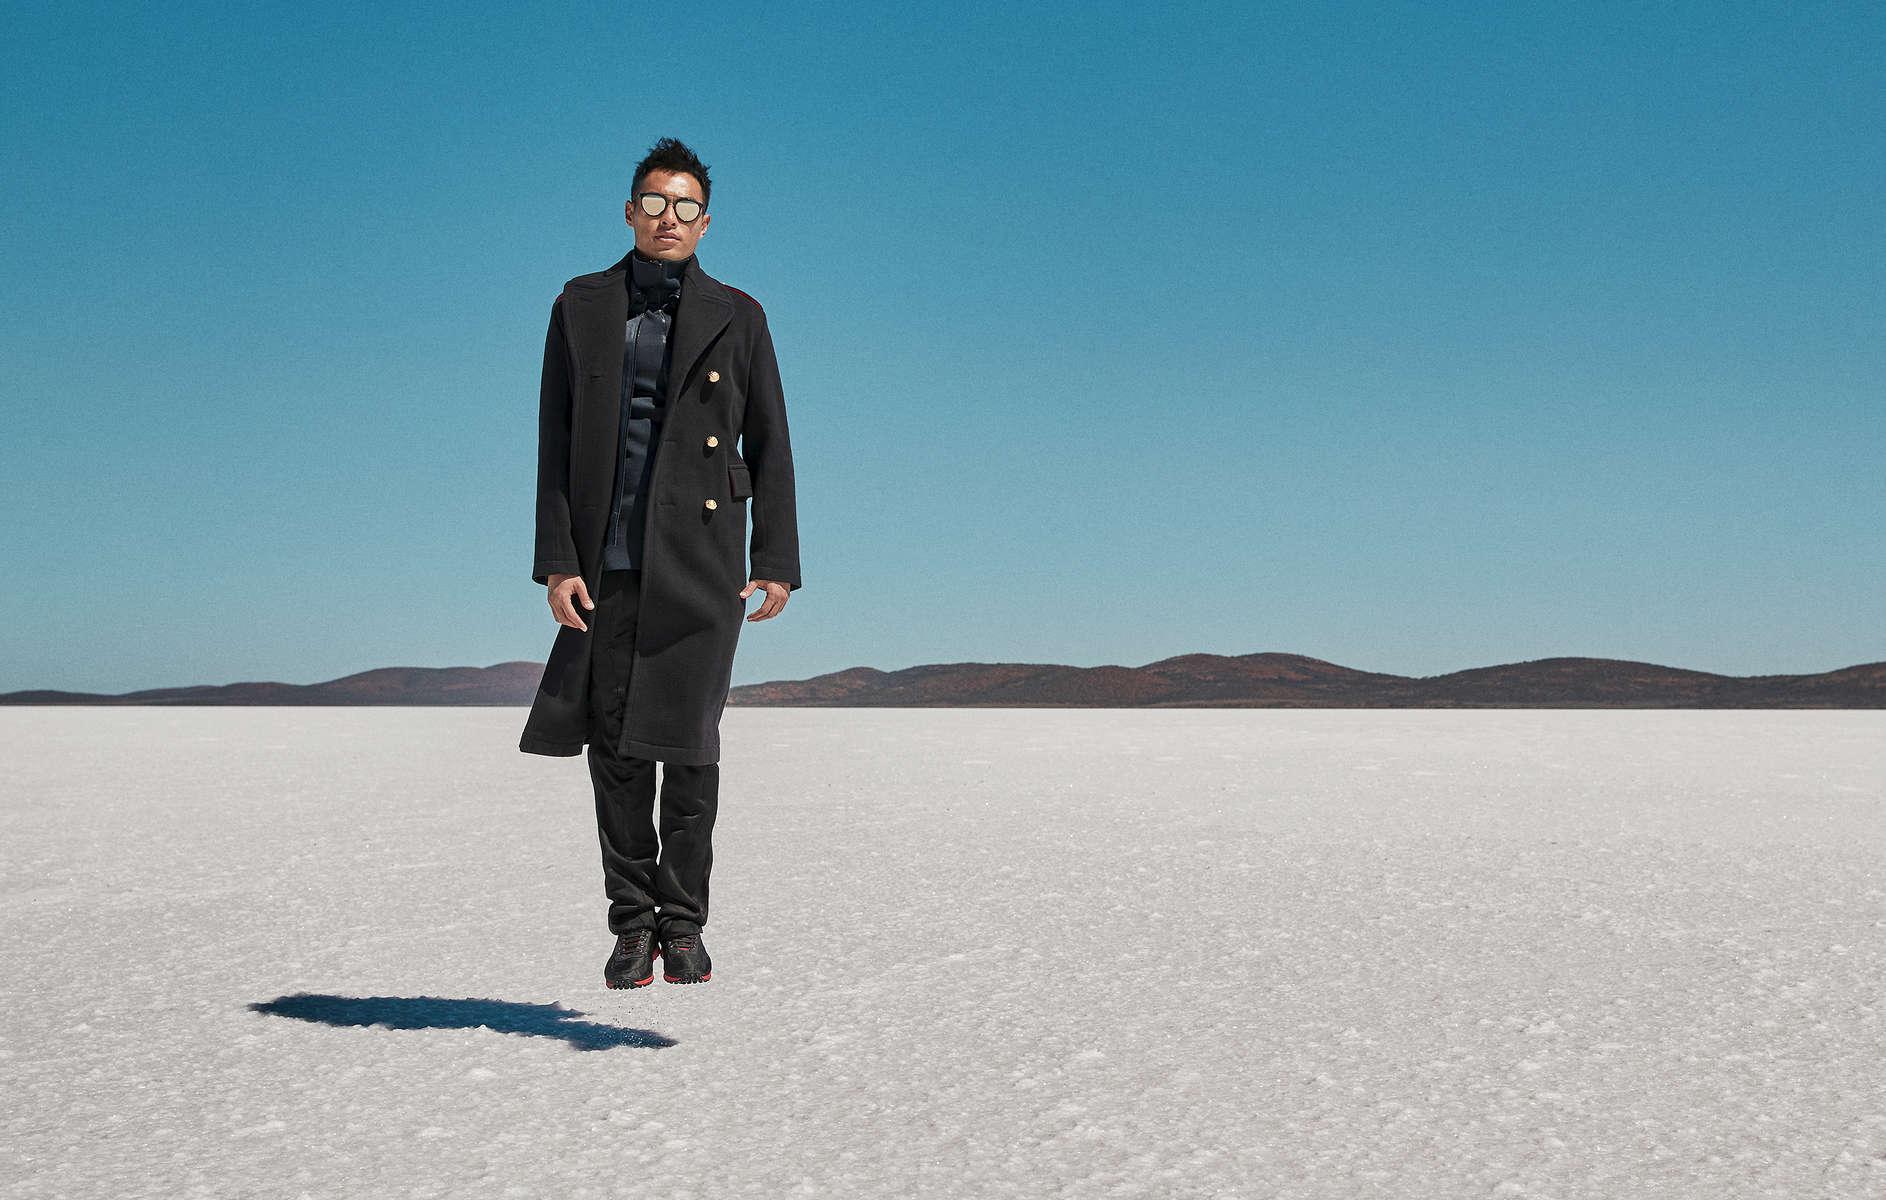 TONY YANG - Taiwanese Actor